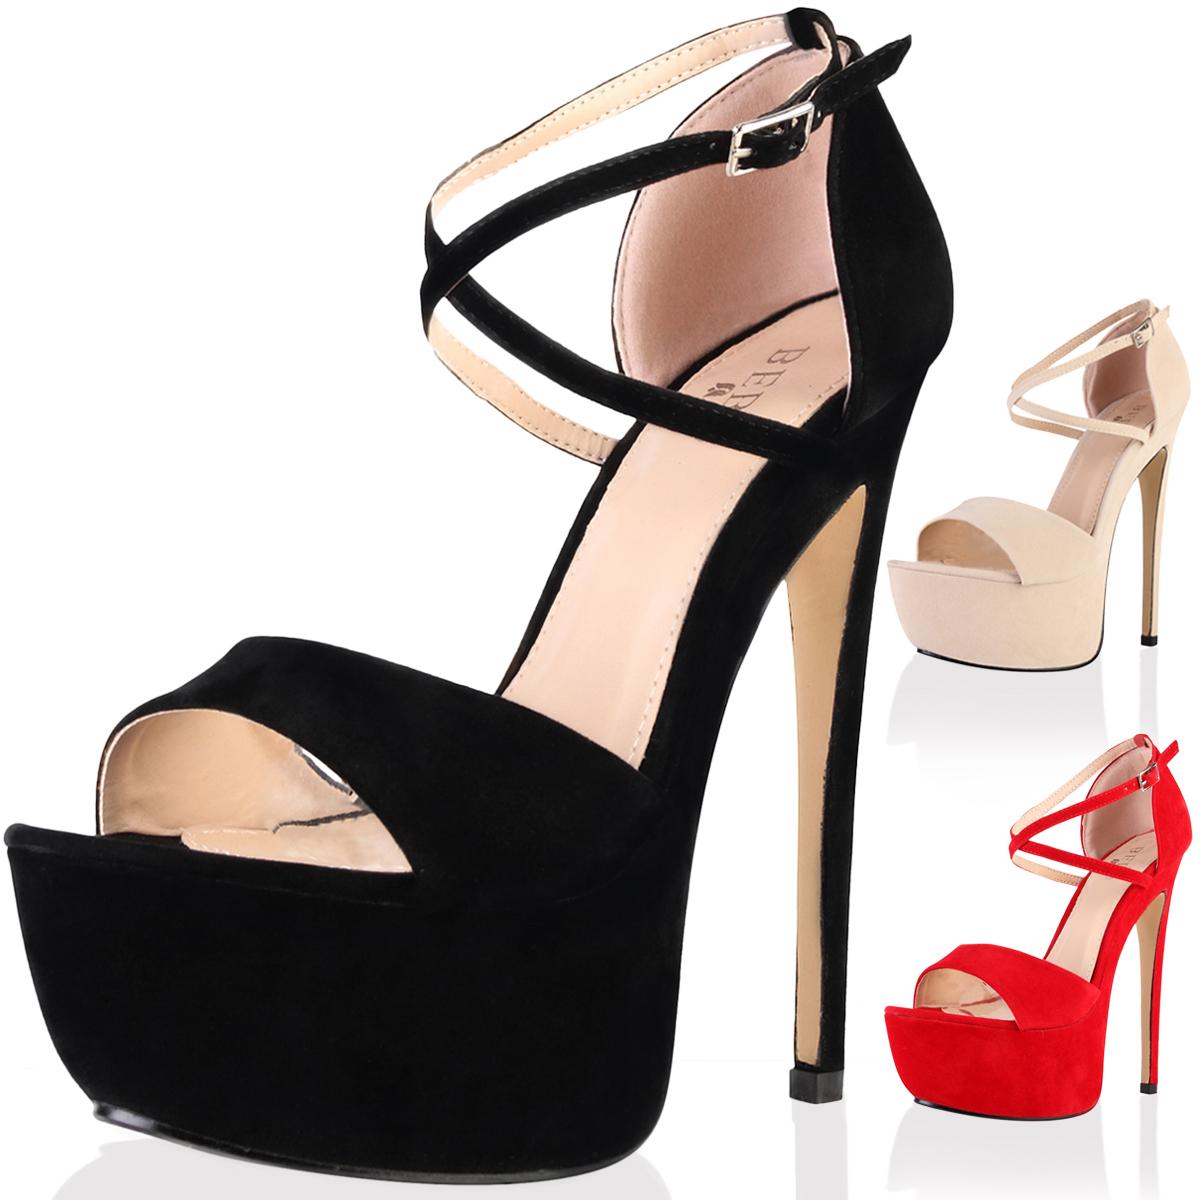 Platform Heels With Strap